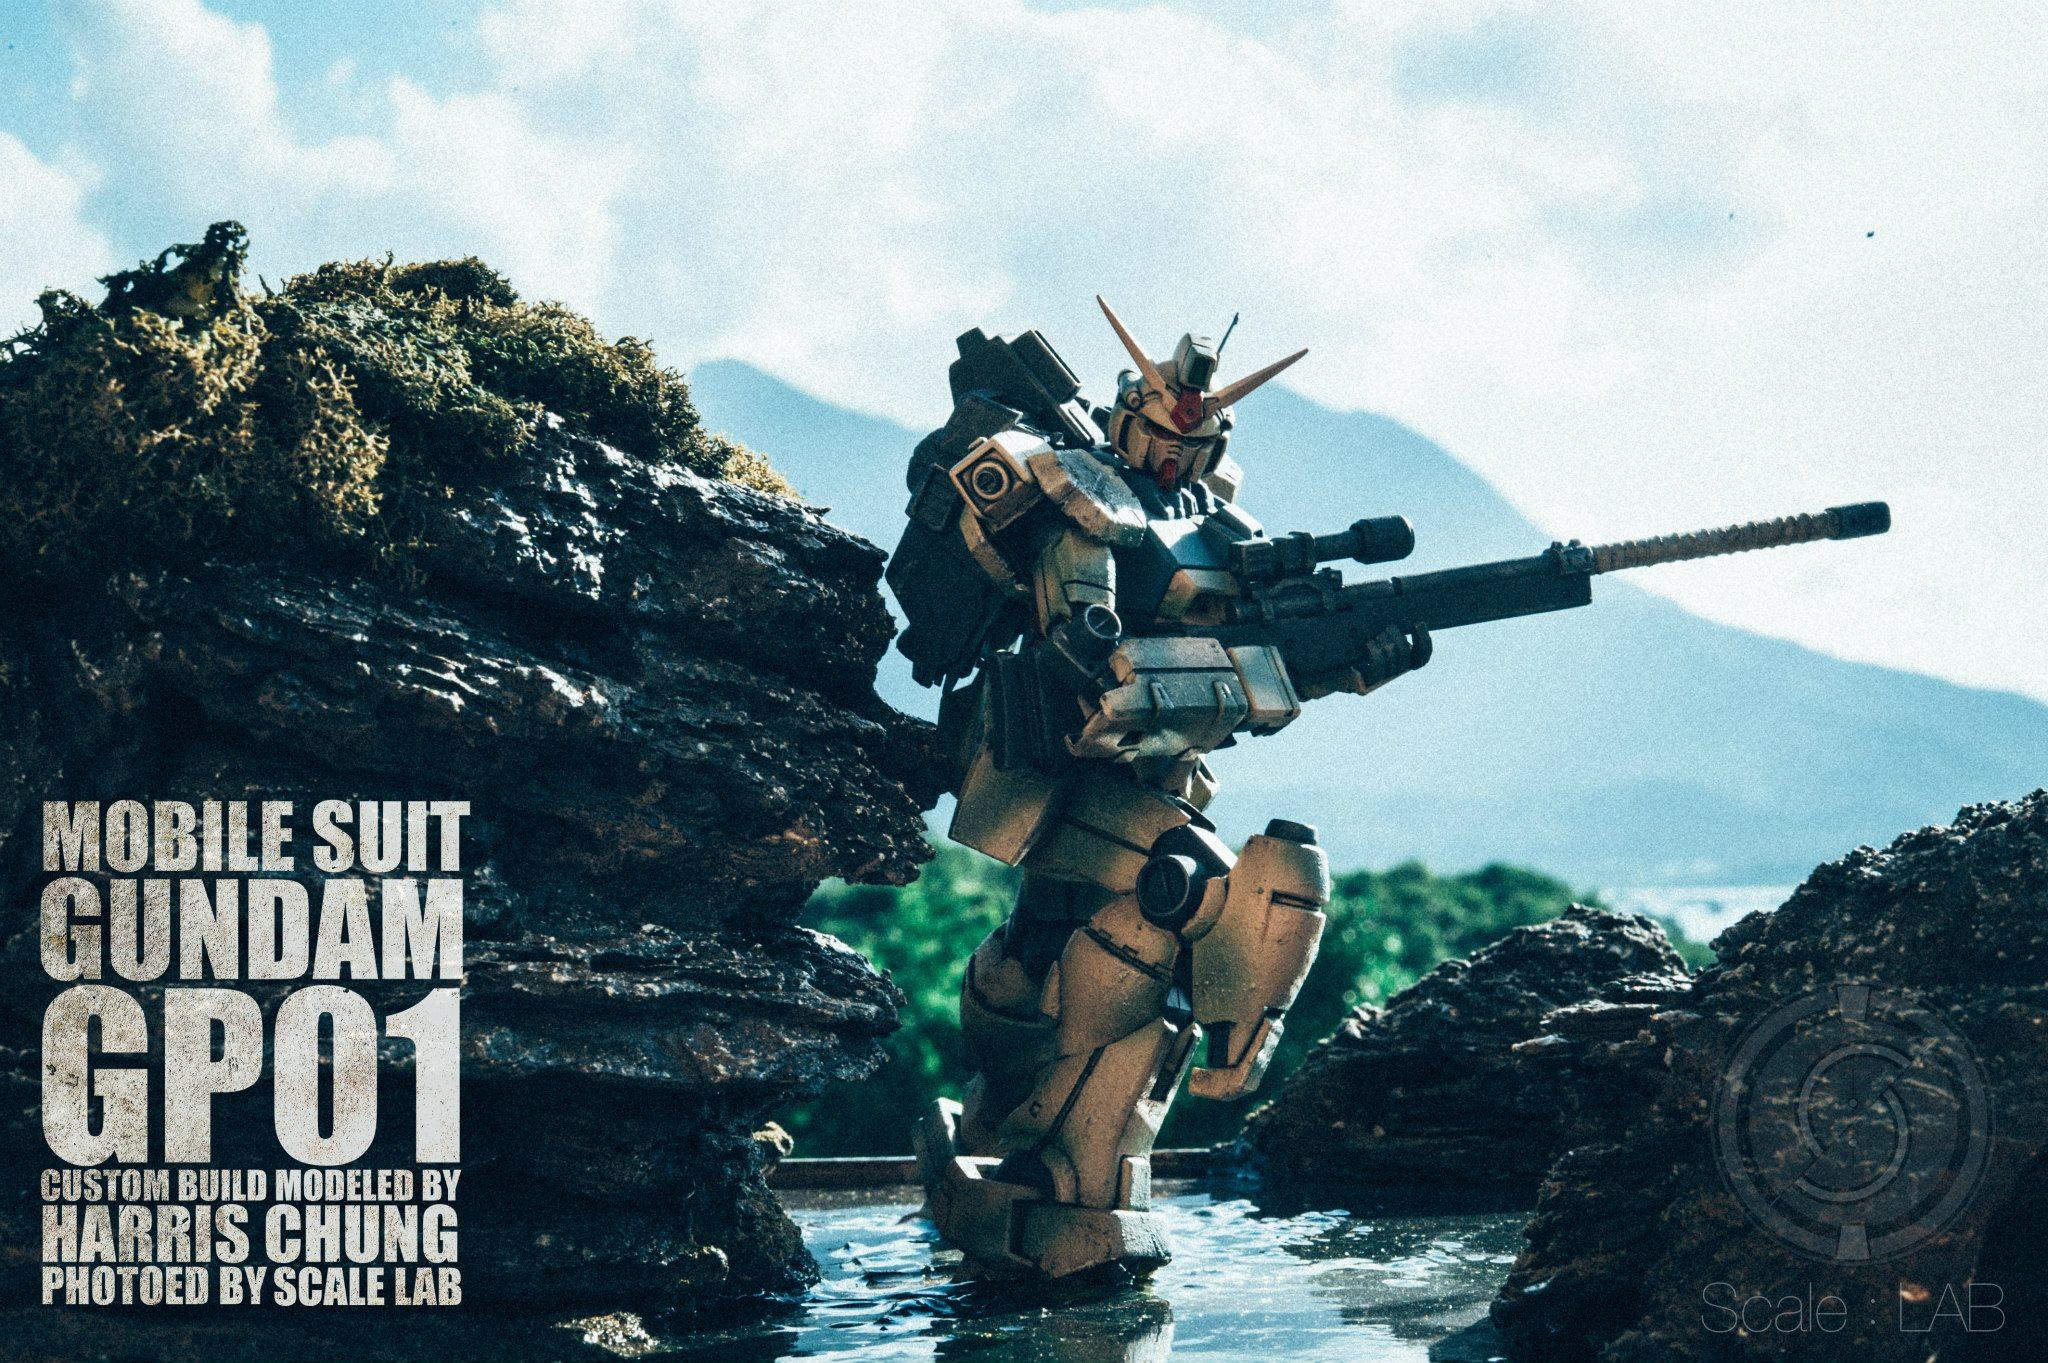 DIORAMA Gundam GP01 Custom Build by Harris Chung. Amazing Photo Editing by Scale LAB! PHOTO REVIEW